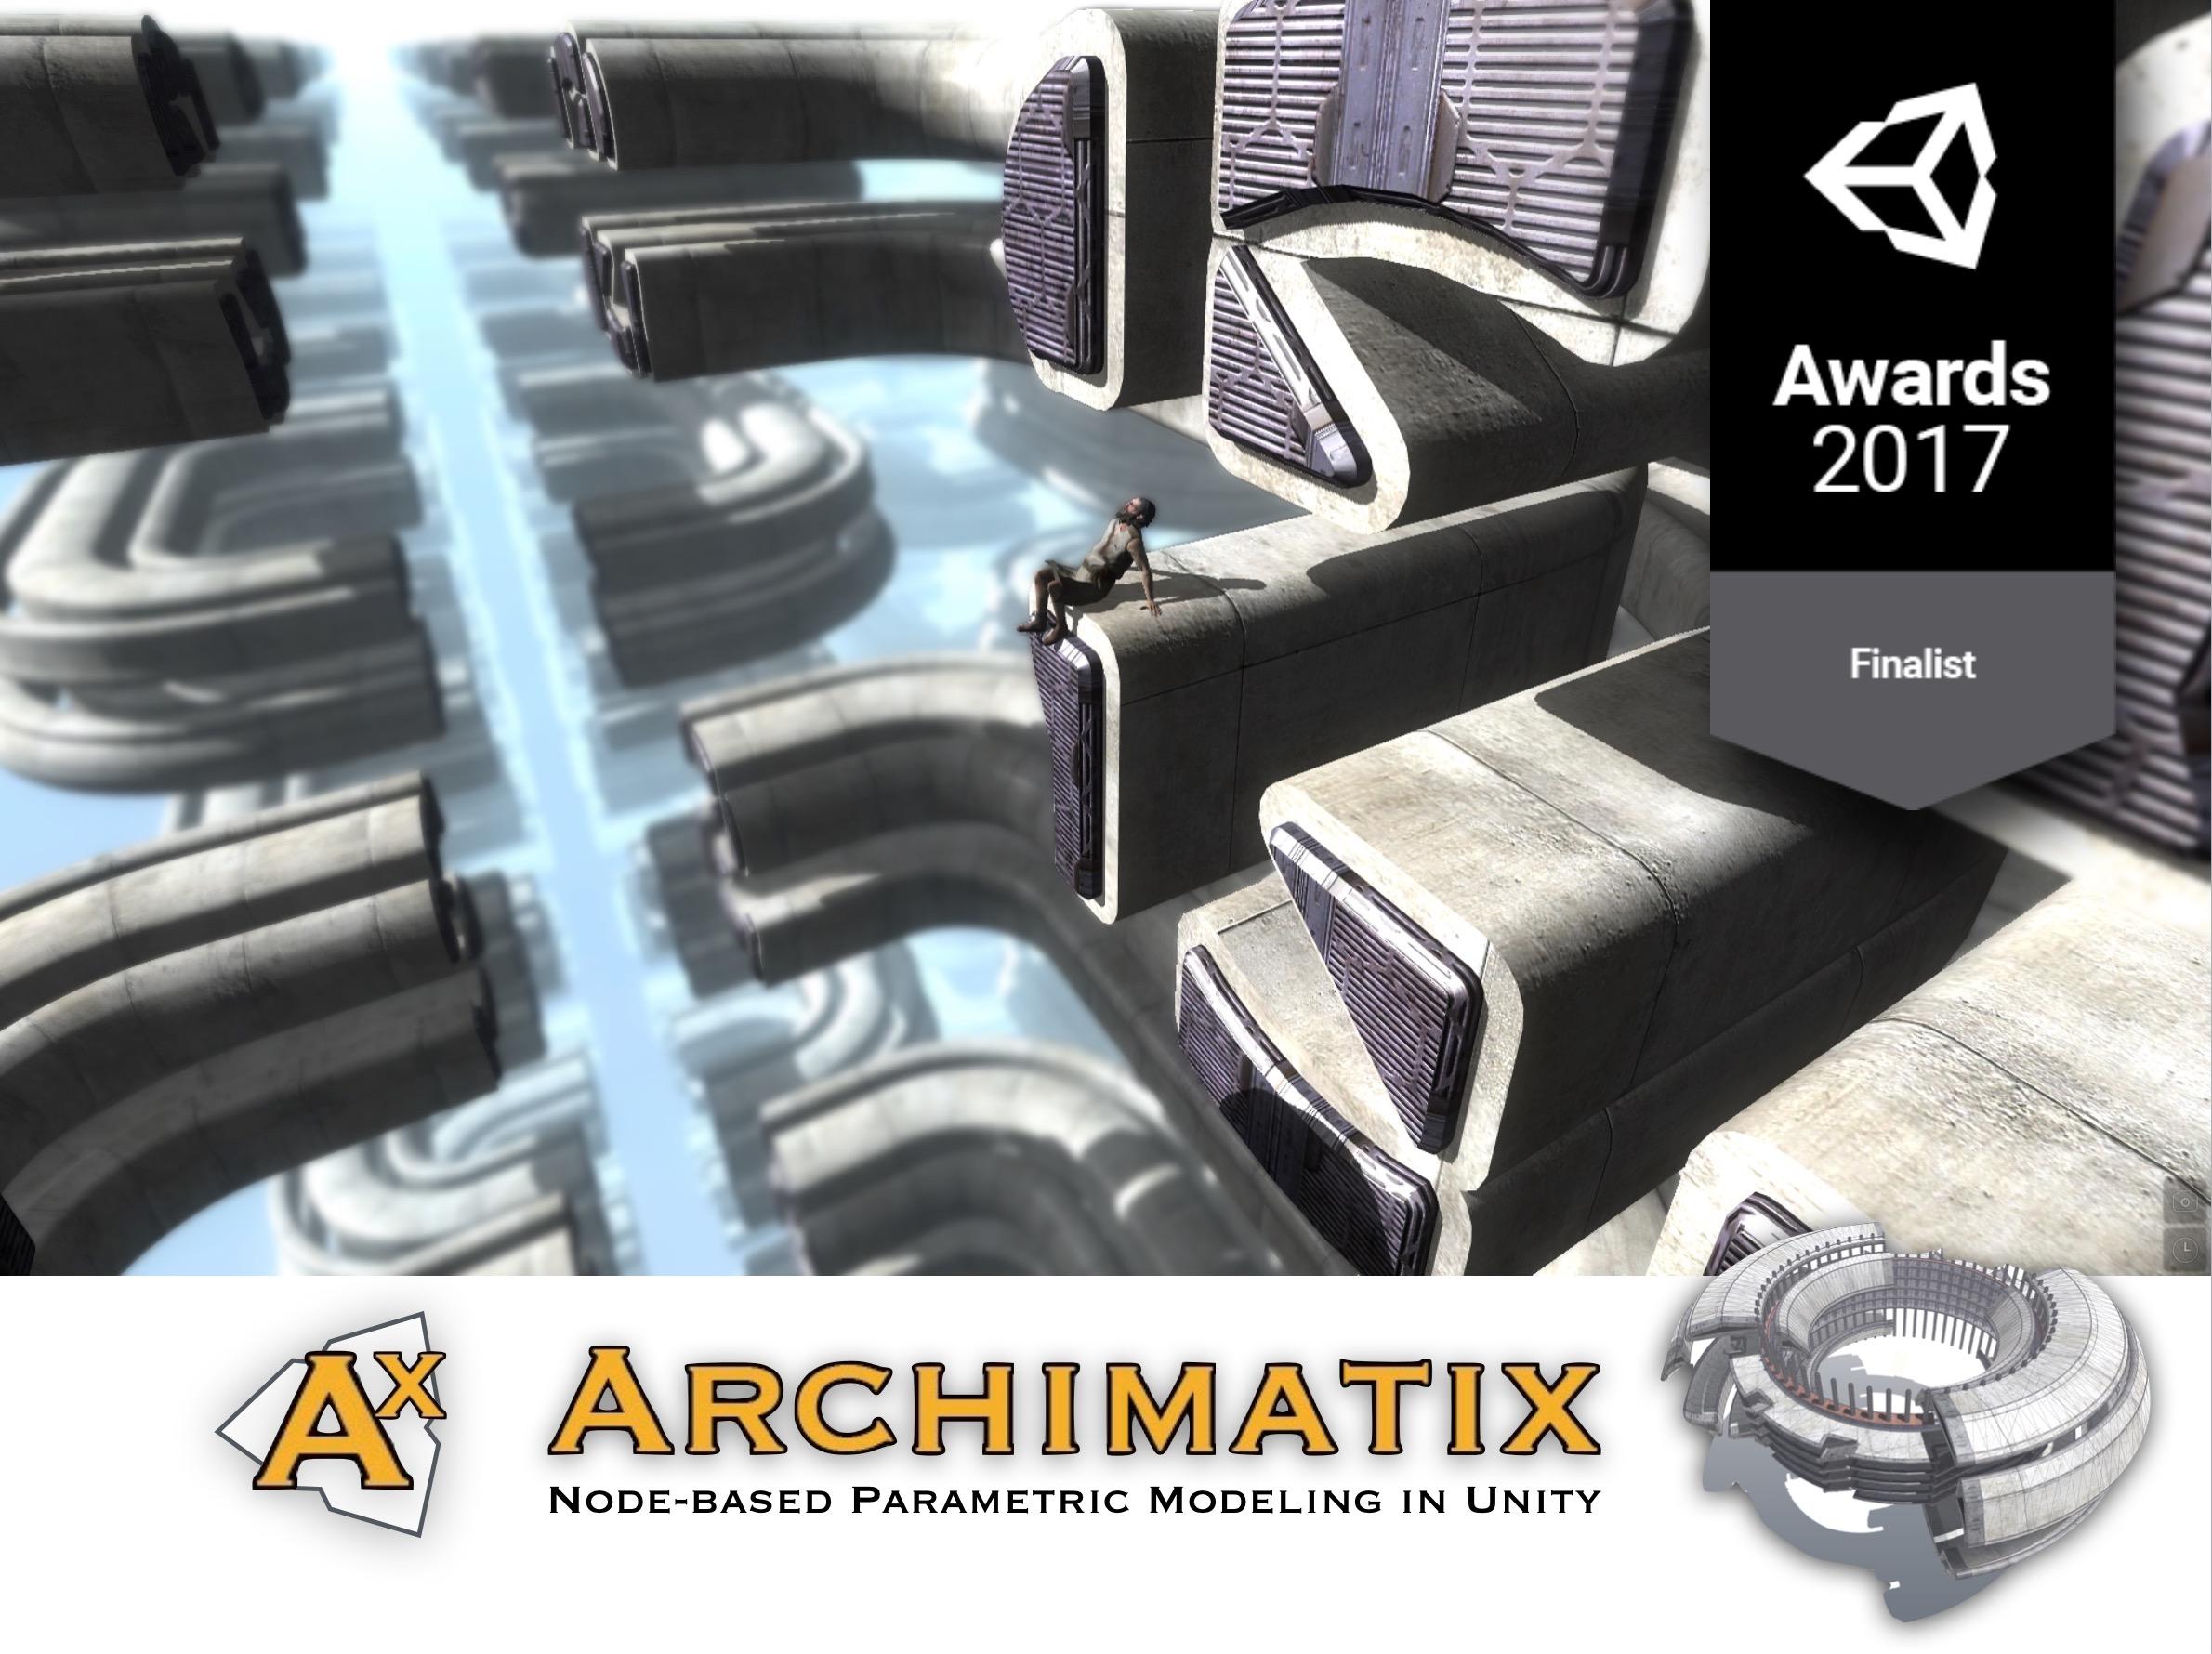 Archimatix 2017-09-13_02-47-27_PM.jpg